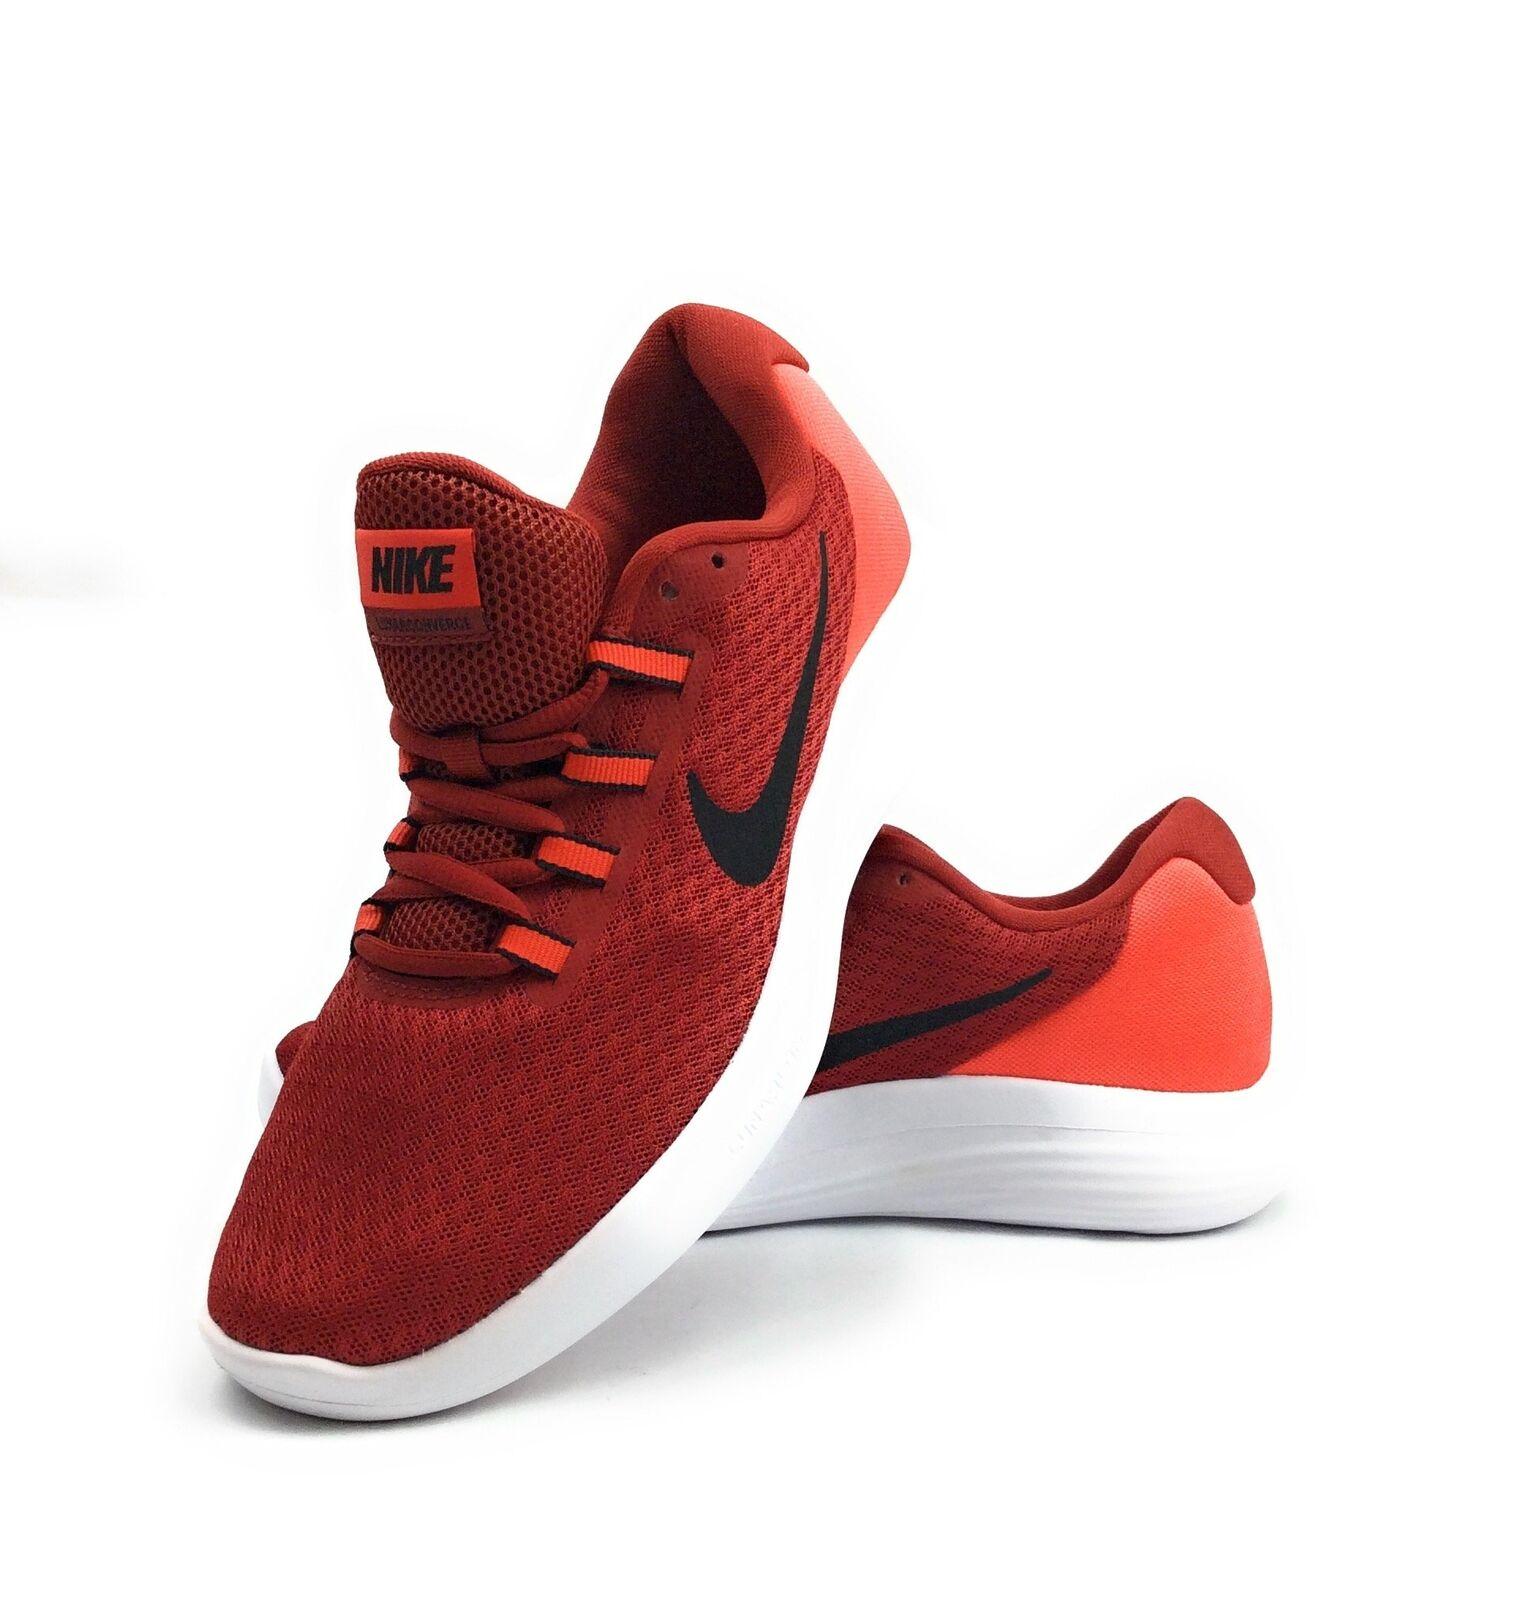 Nike Men's Lunarconverge Running shoes Size 7.5 Medium